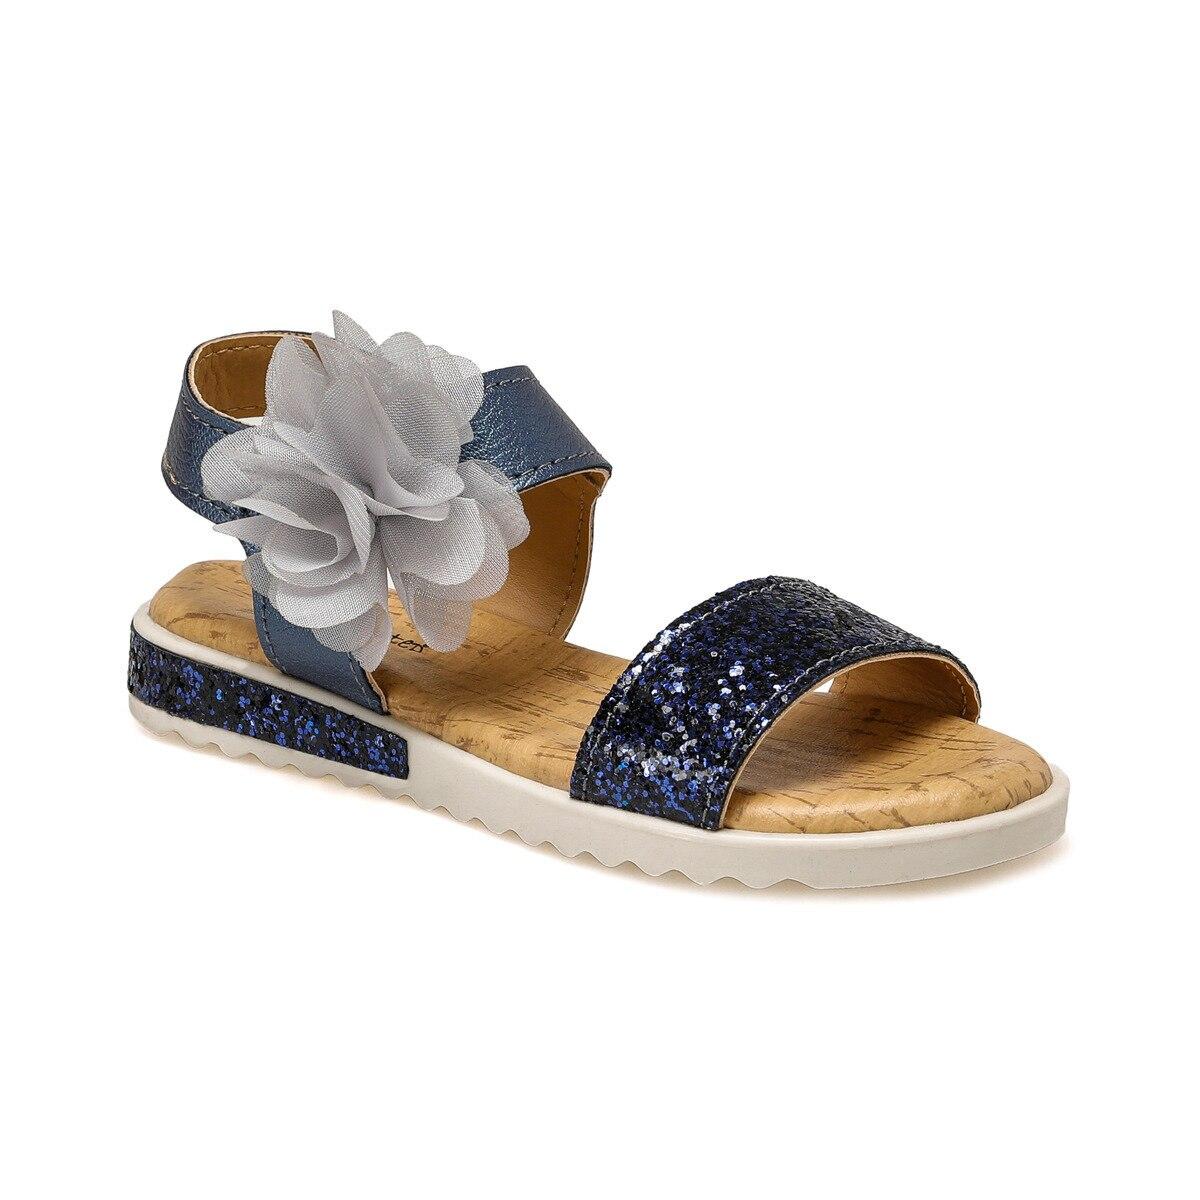 FLO SUVLA bleu marine femme enfant sandales PINKSTEP